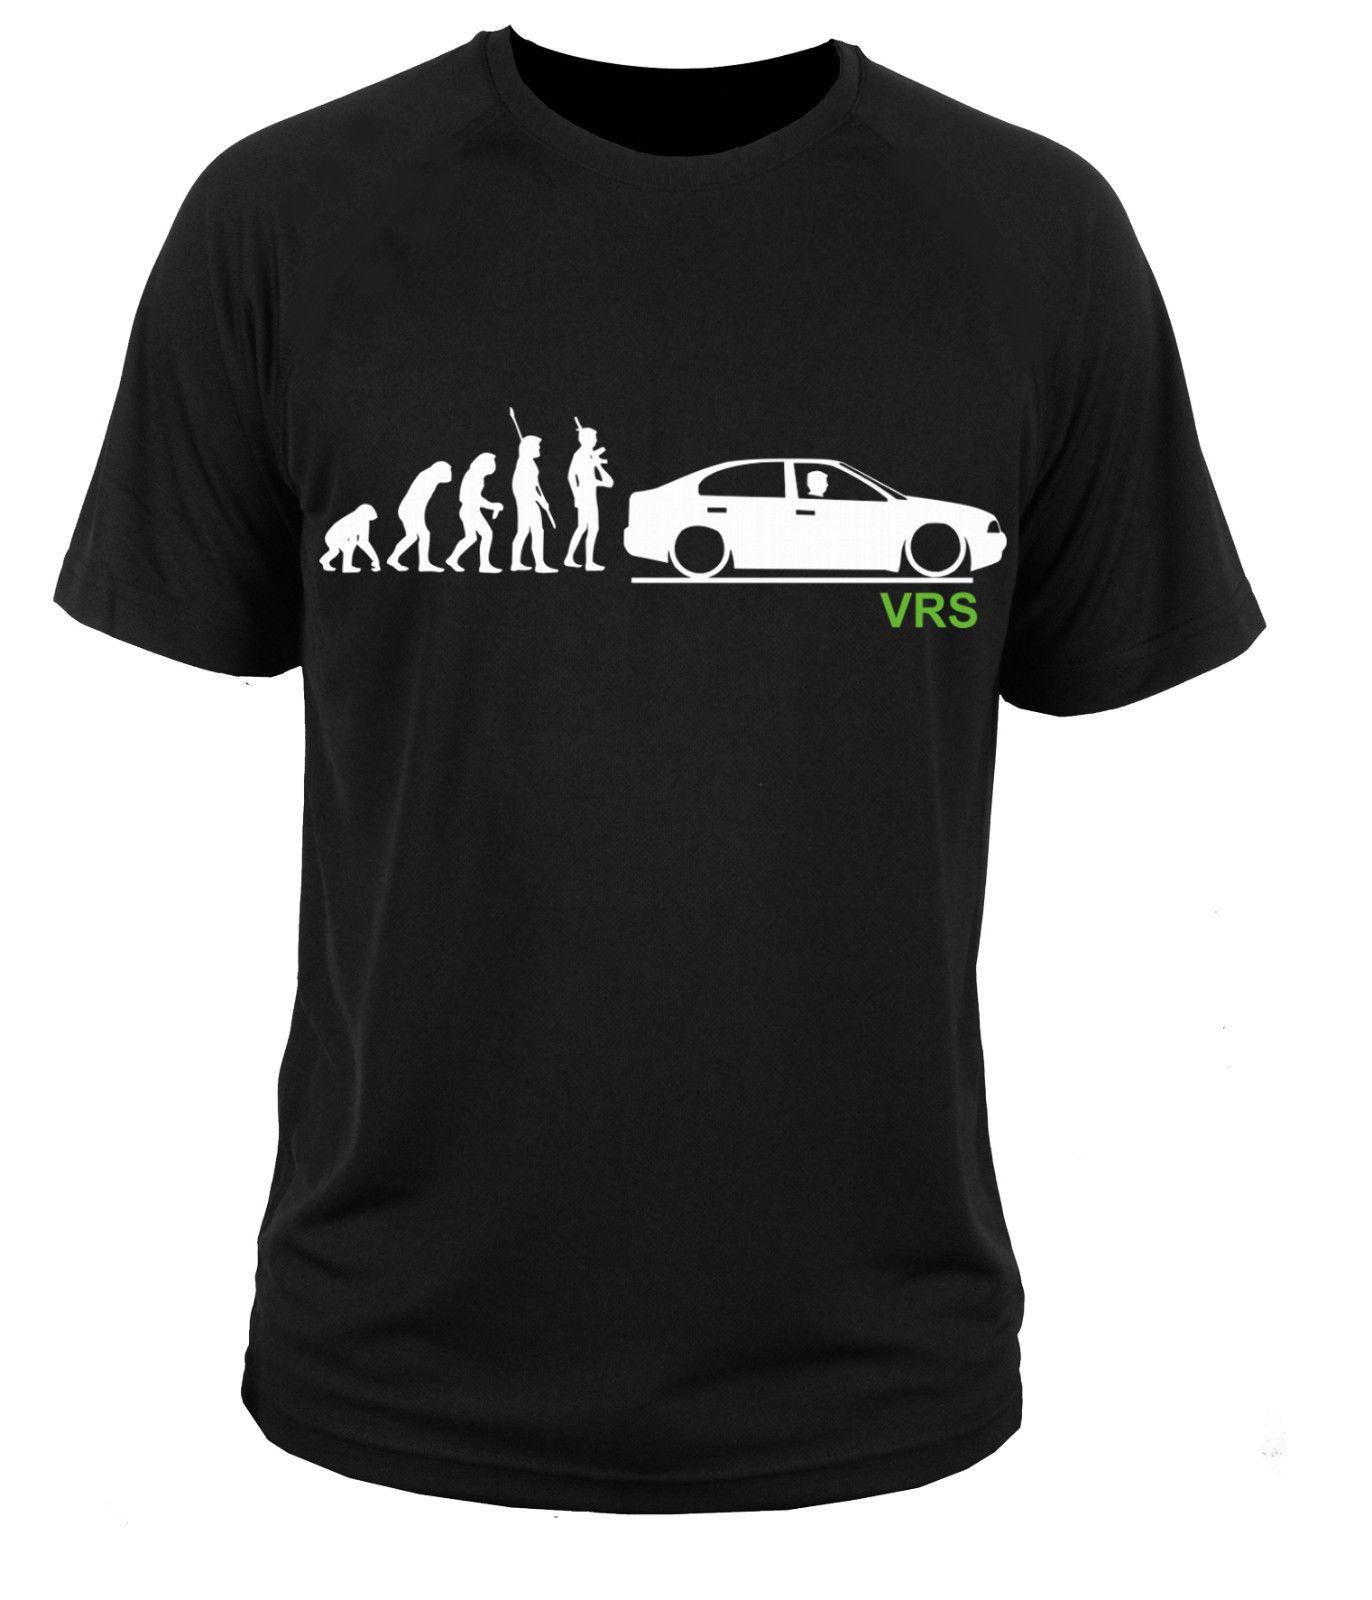 T shirt t-shirt Skoda octavia superb fabia rapid vrs Short Sleeve O-Neck Cotton T shirt 2018 New 100% Cotton T-Shirts Men